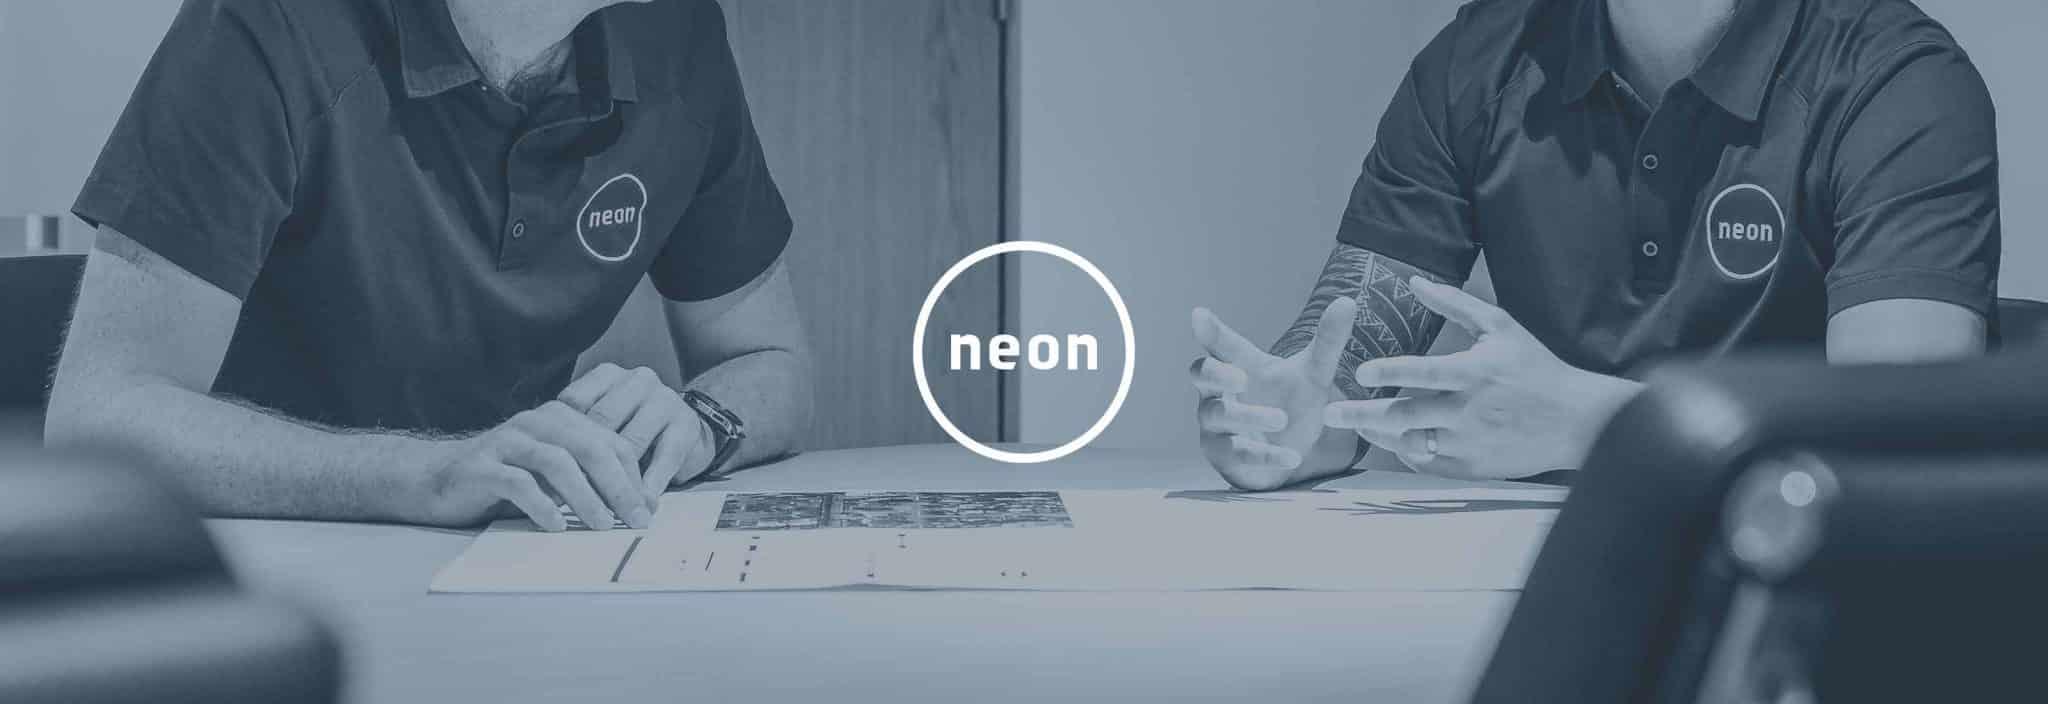 1 4S Work Neon Hero